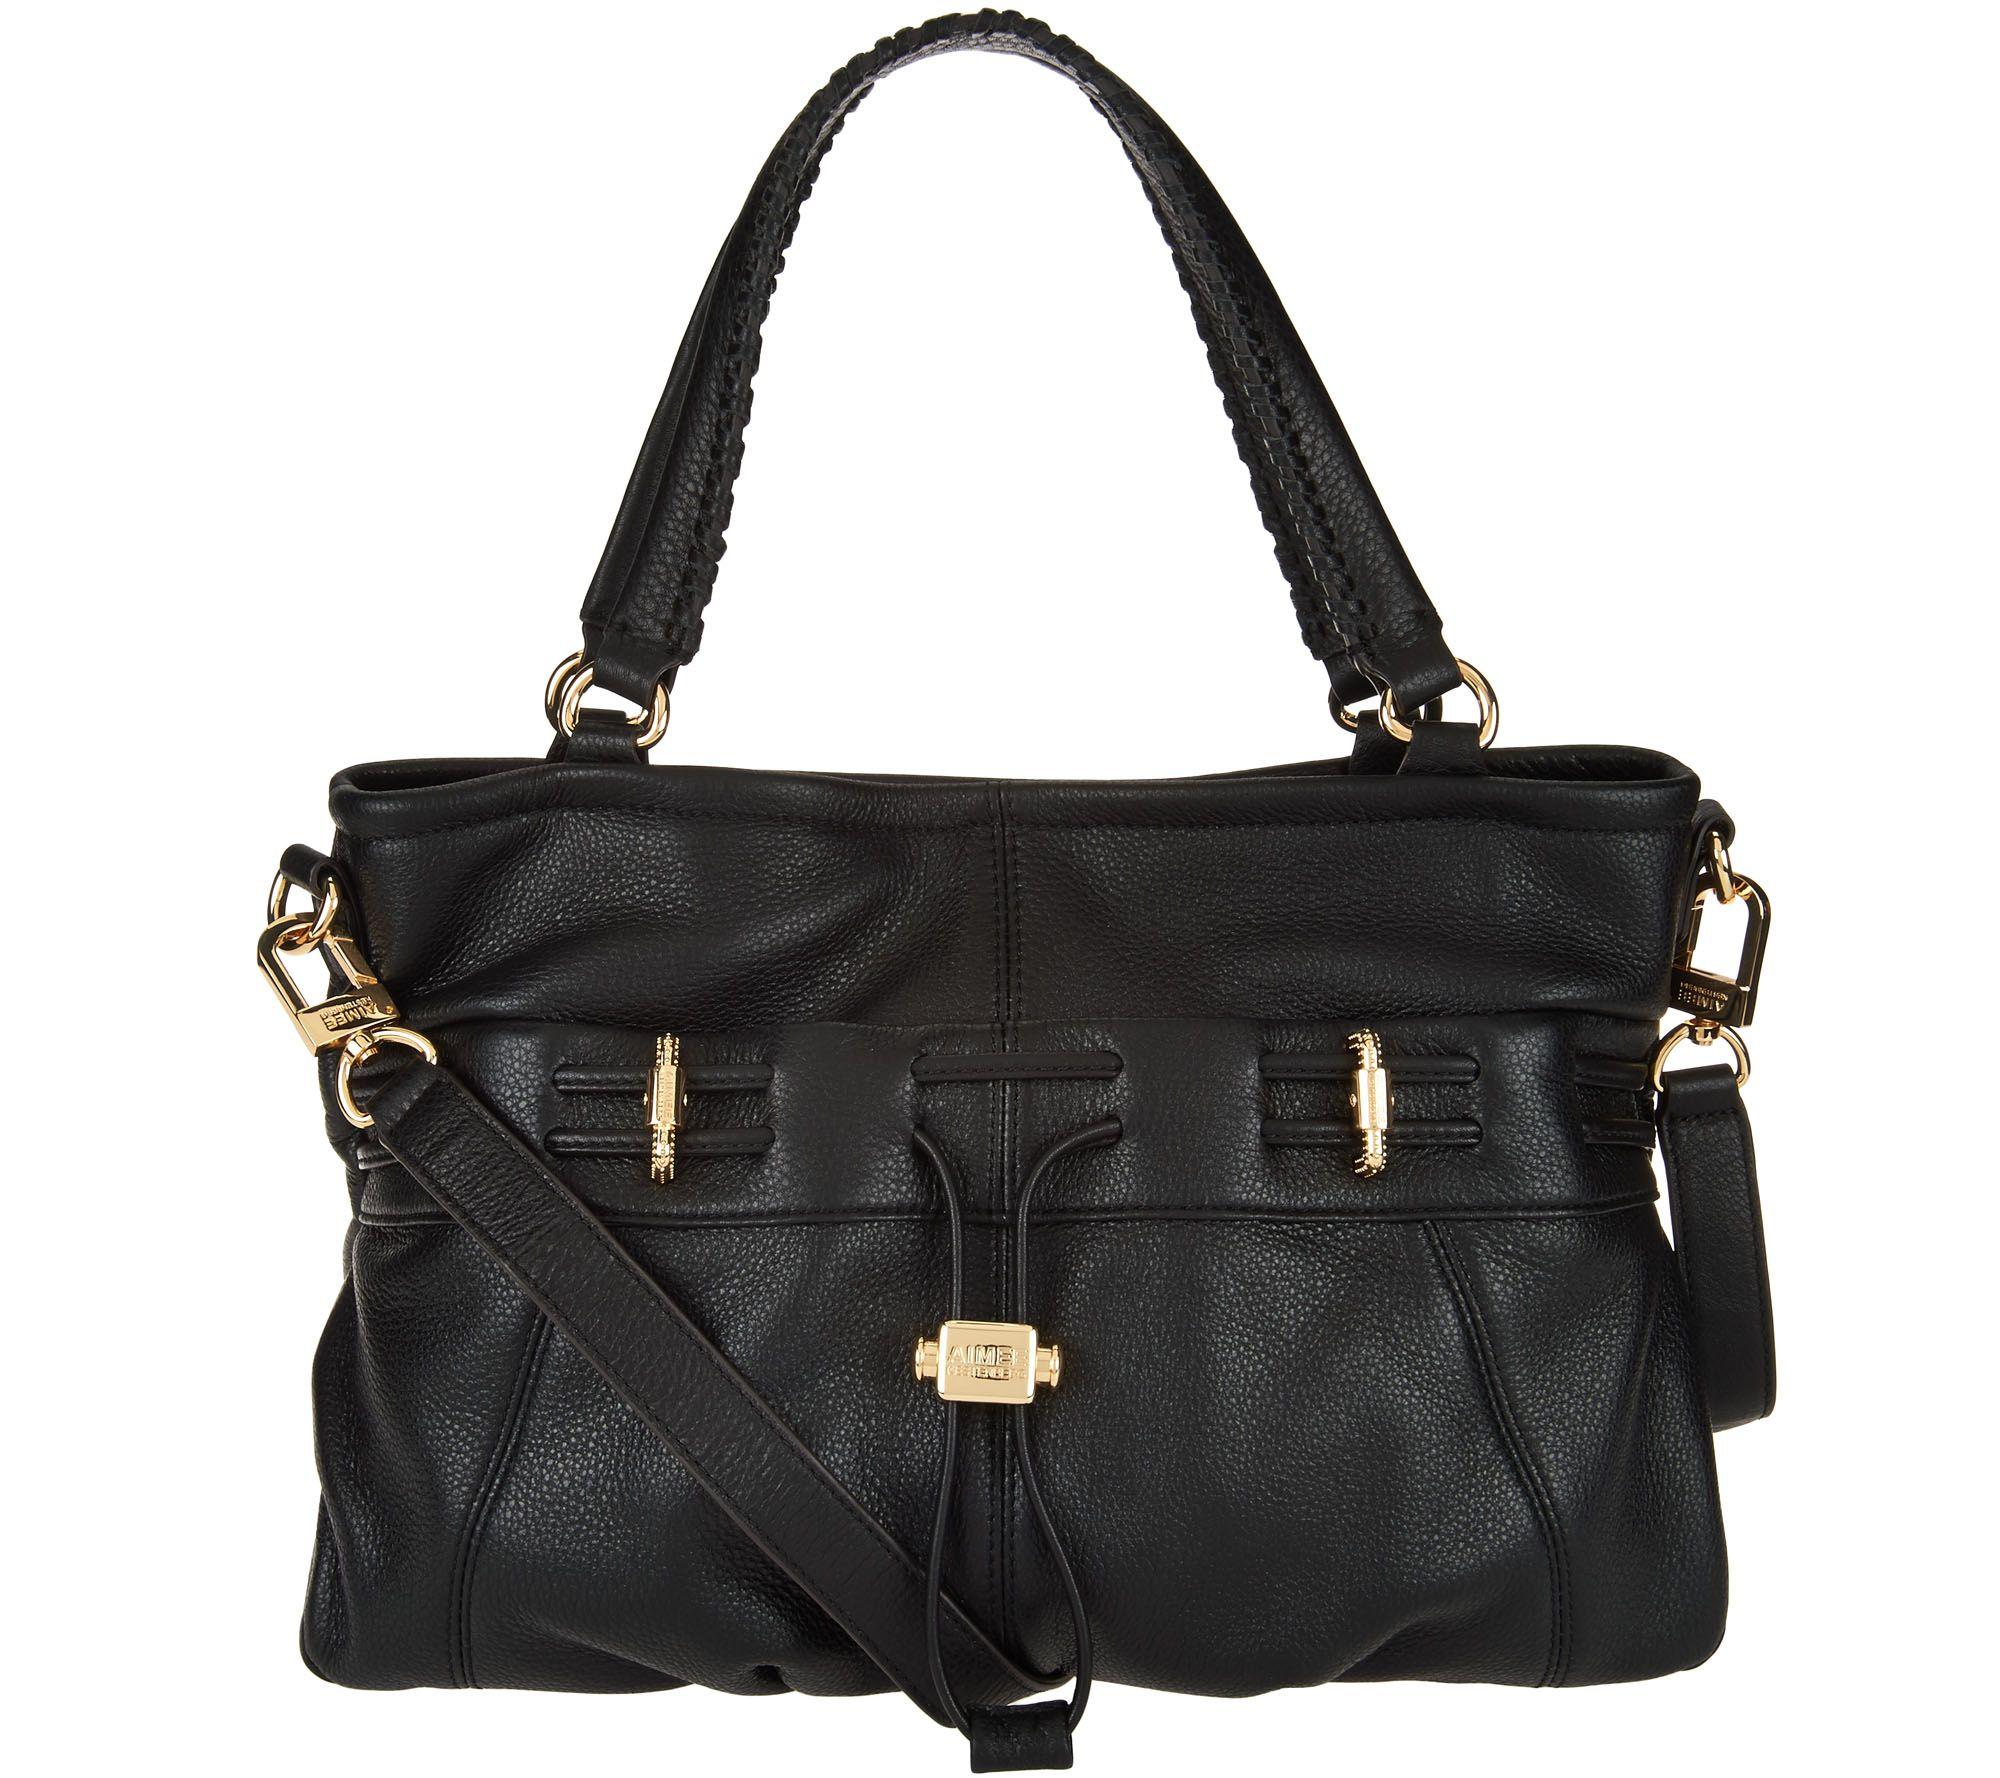 Coach Luggage Handbags Qvc Instructions Coachclearance